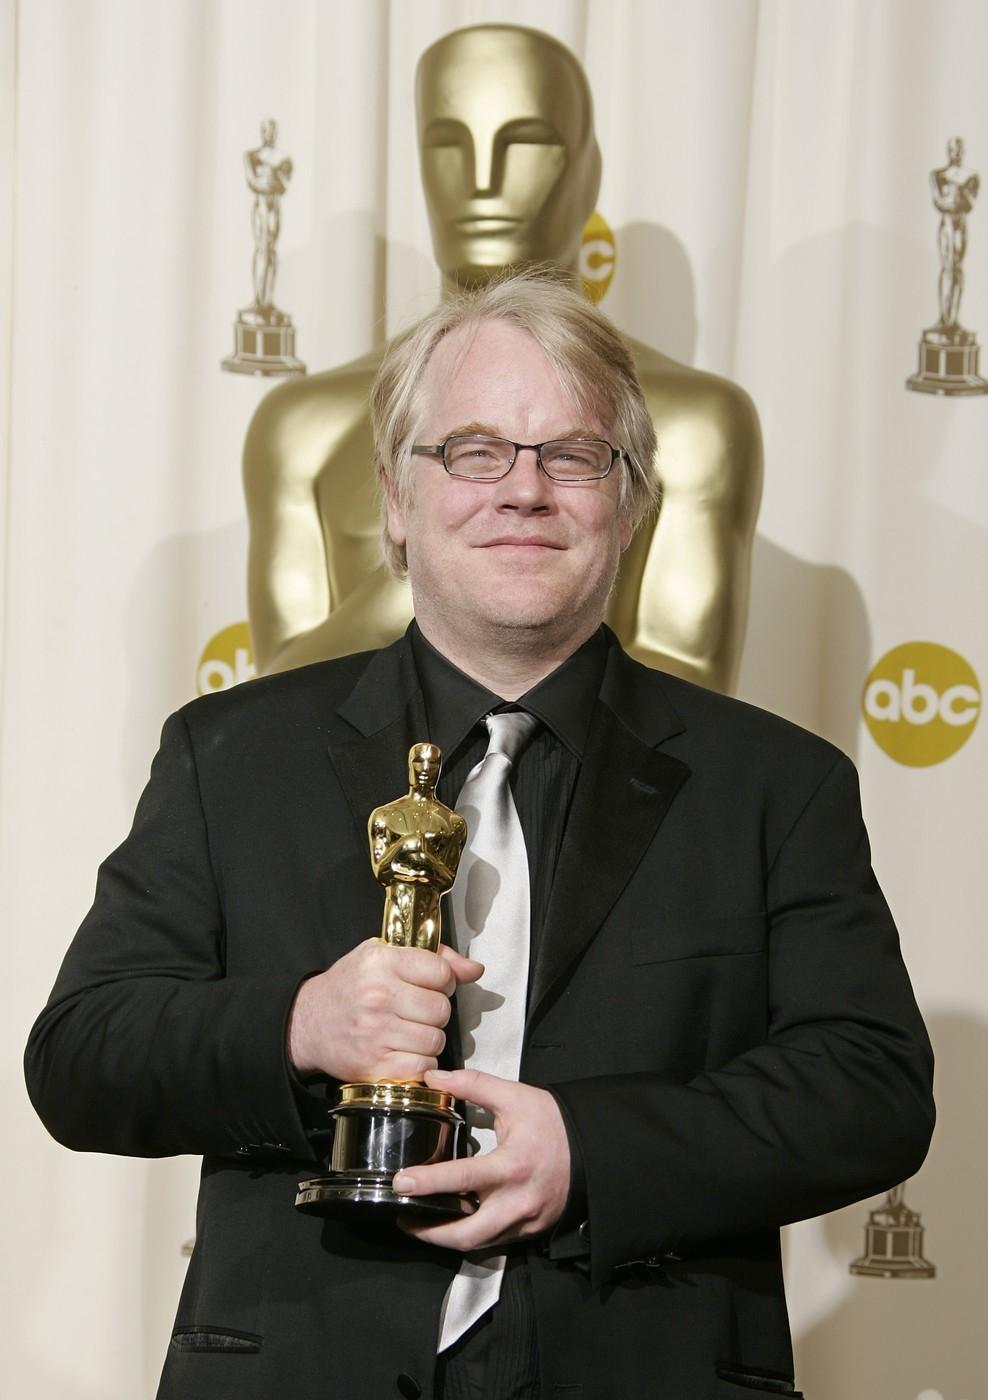 Za svoji roli Trumana Capota získal Oscara